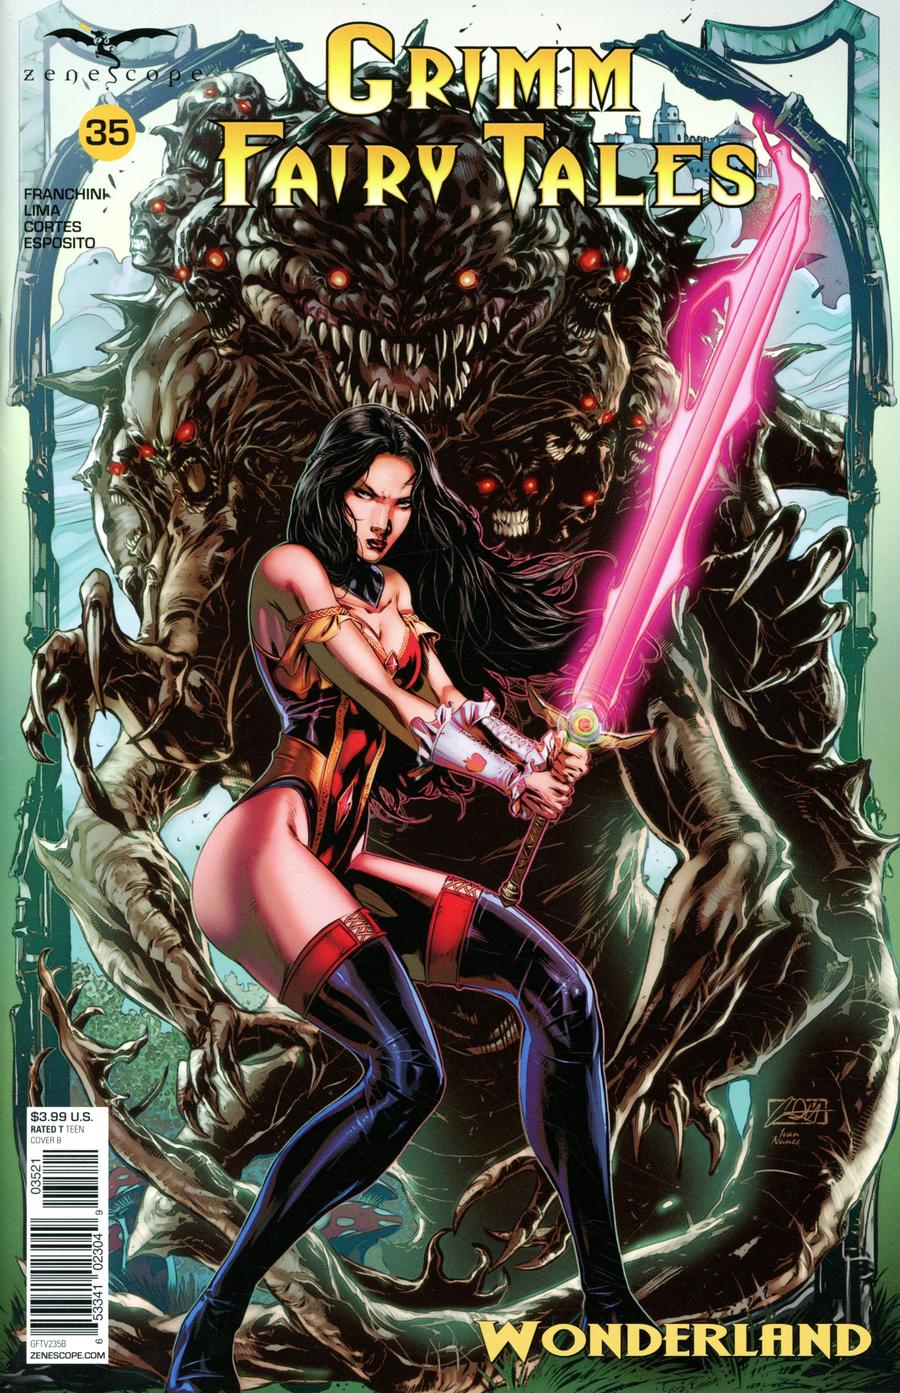 Grimm Fairy Tales Vol 2 #35 Cover B Caanan White